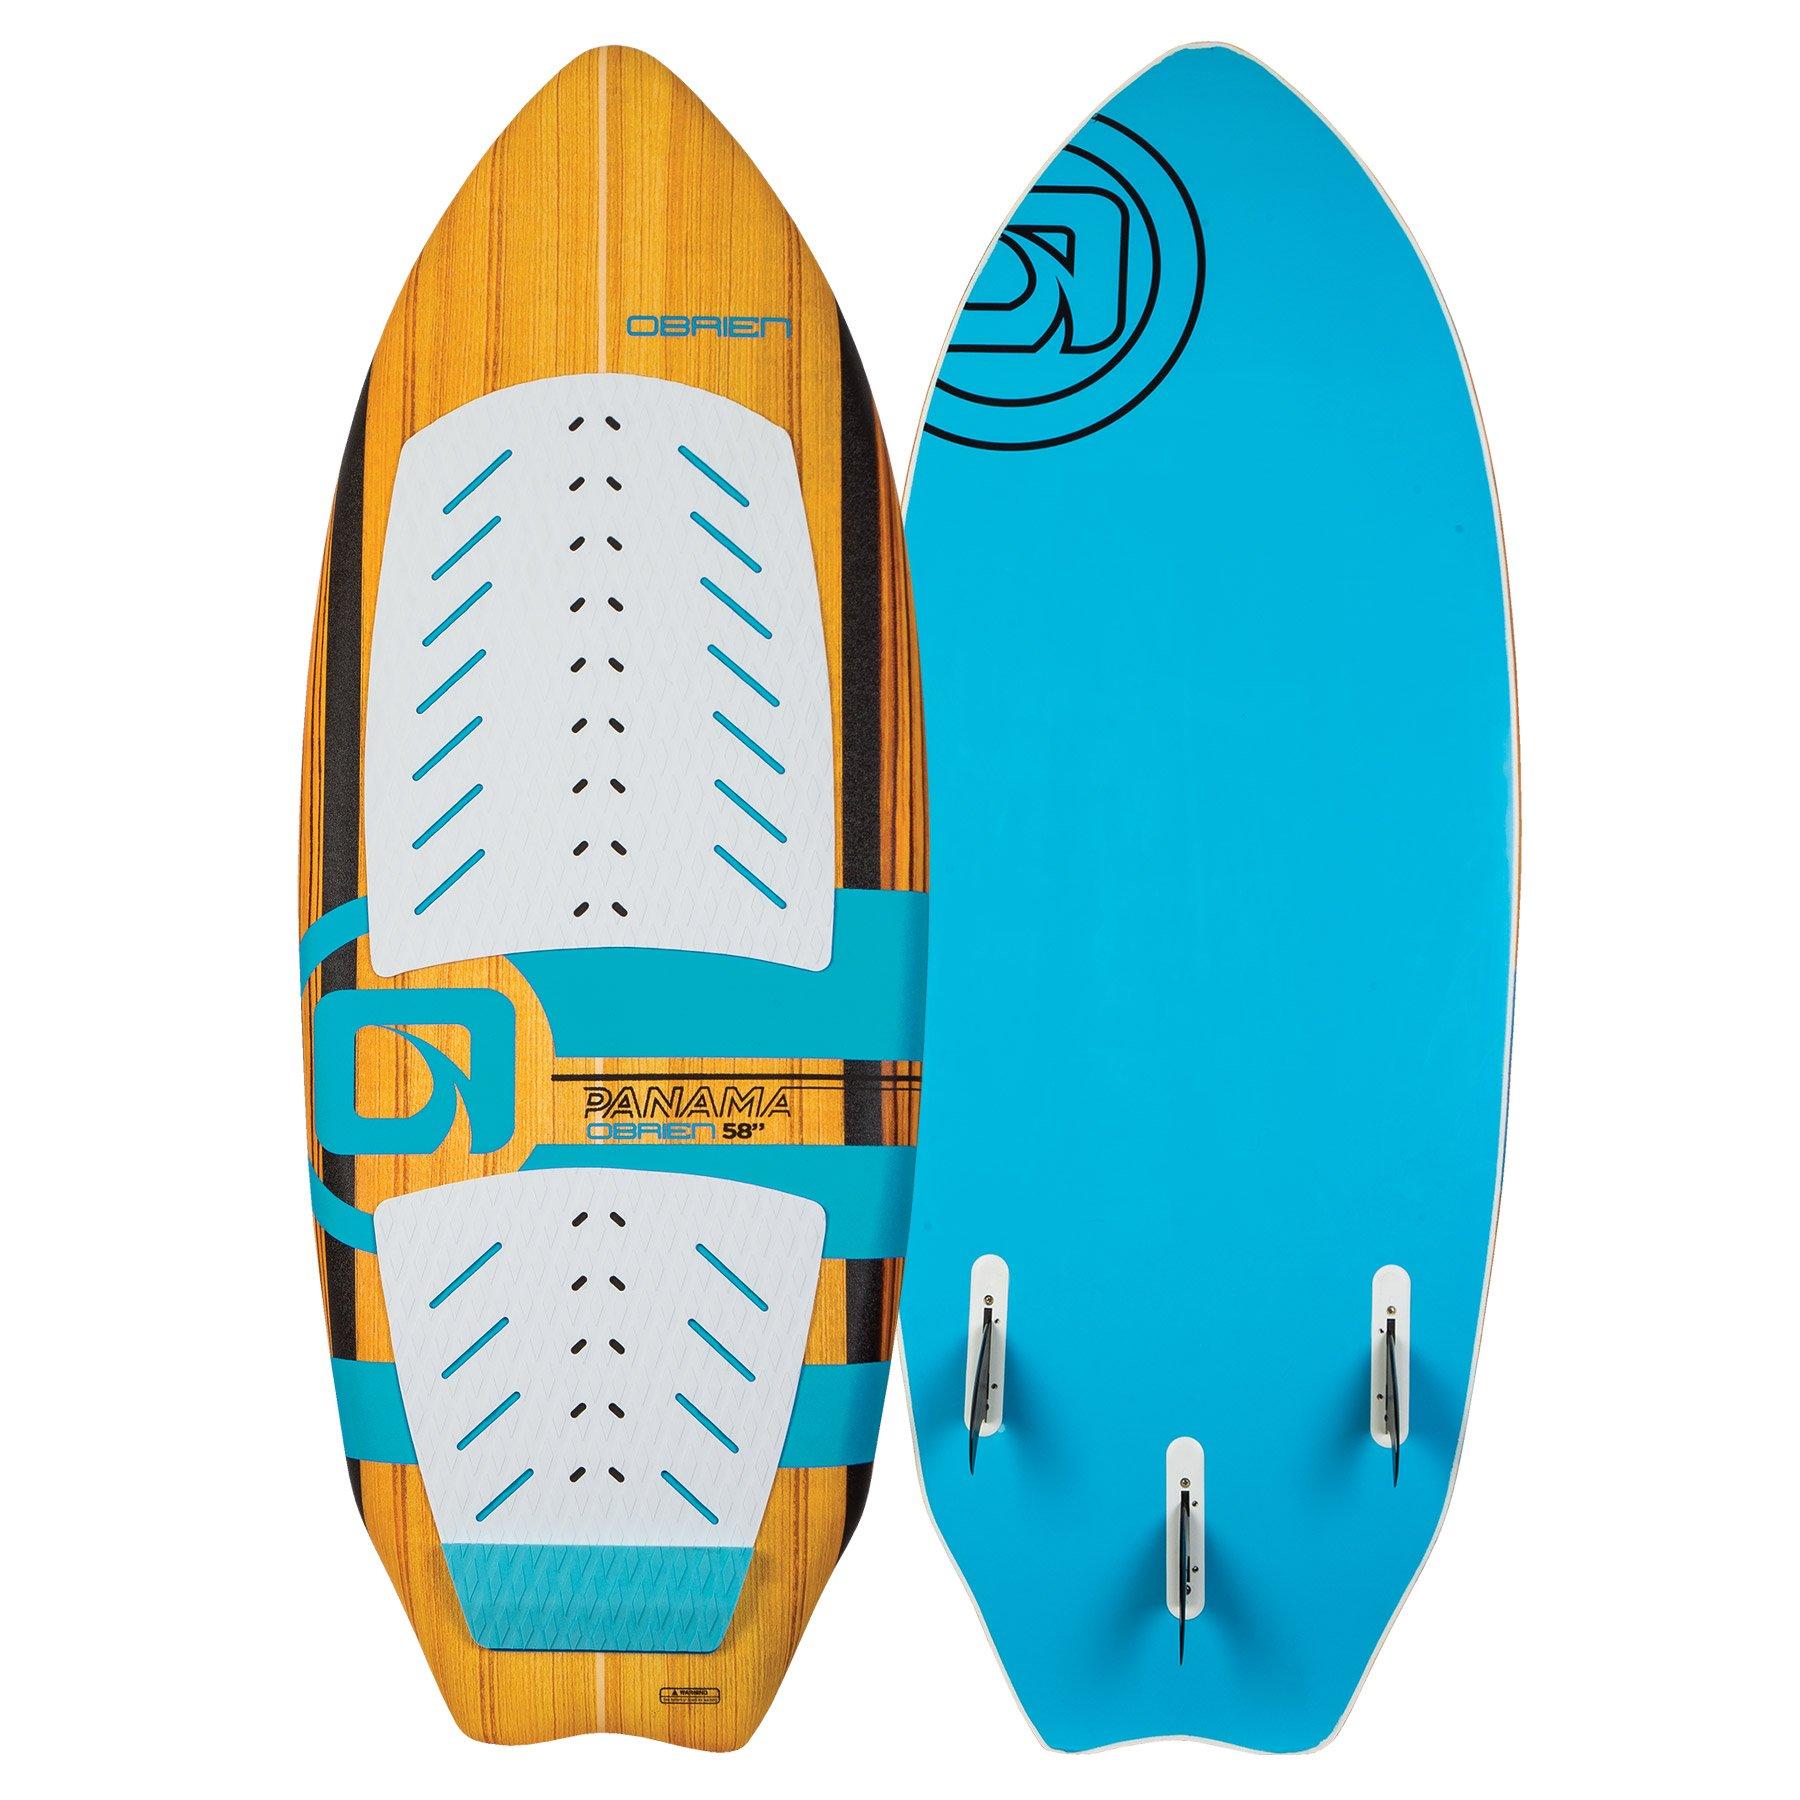 O'Brien Panama Wakesurf Board, 58''